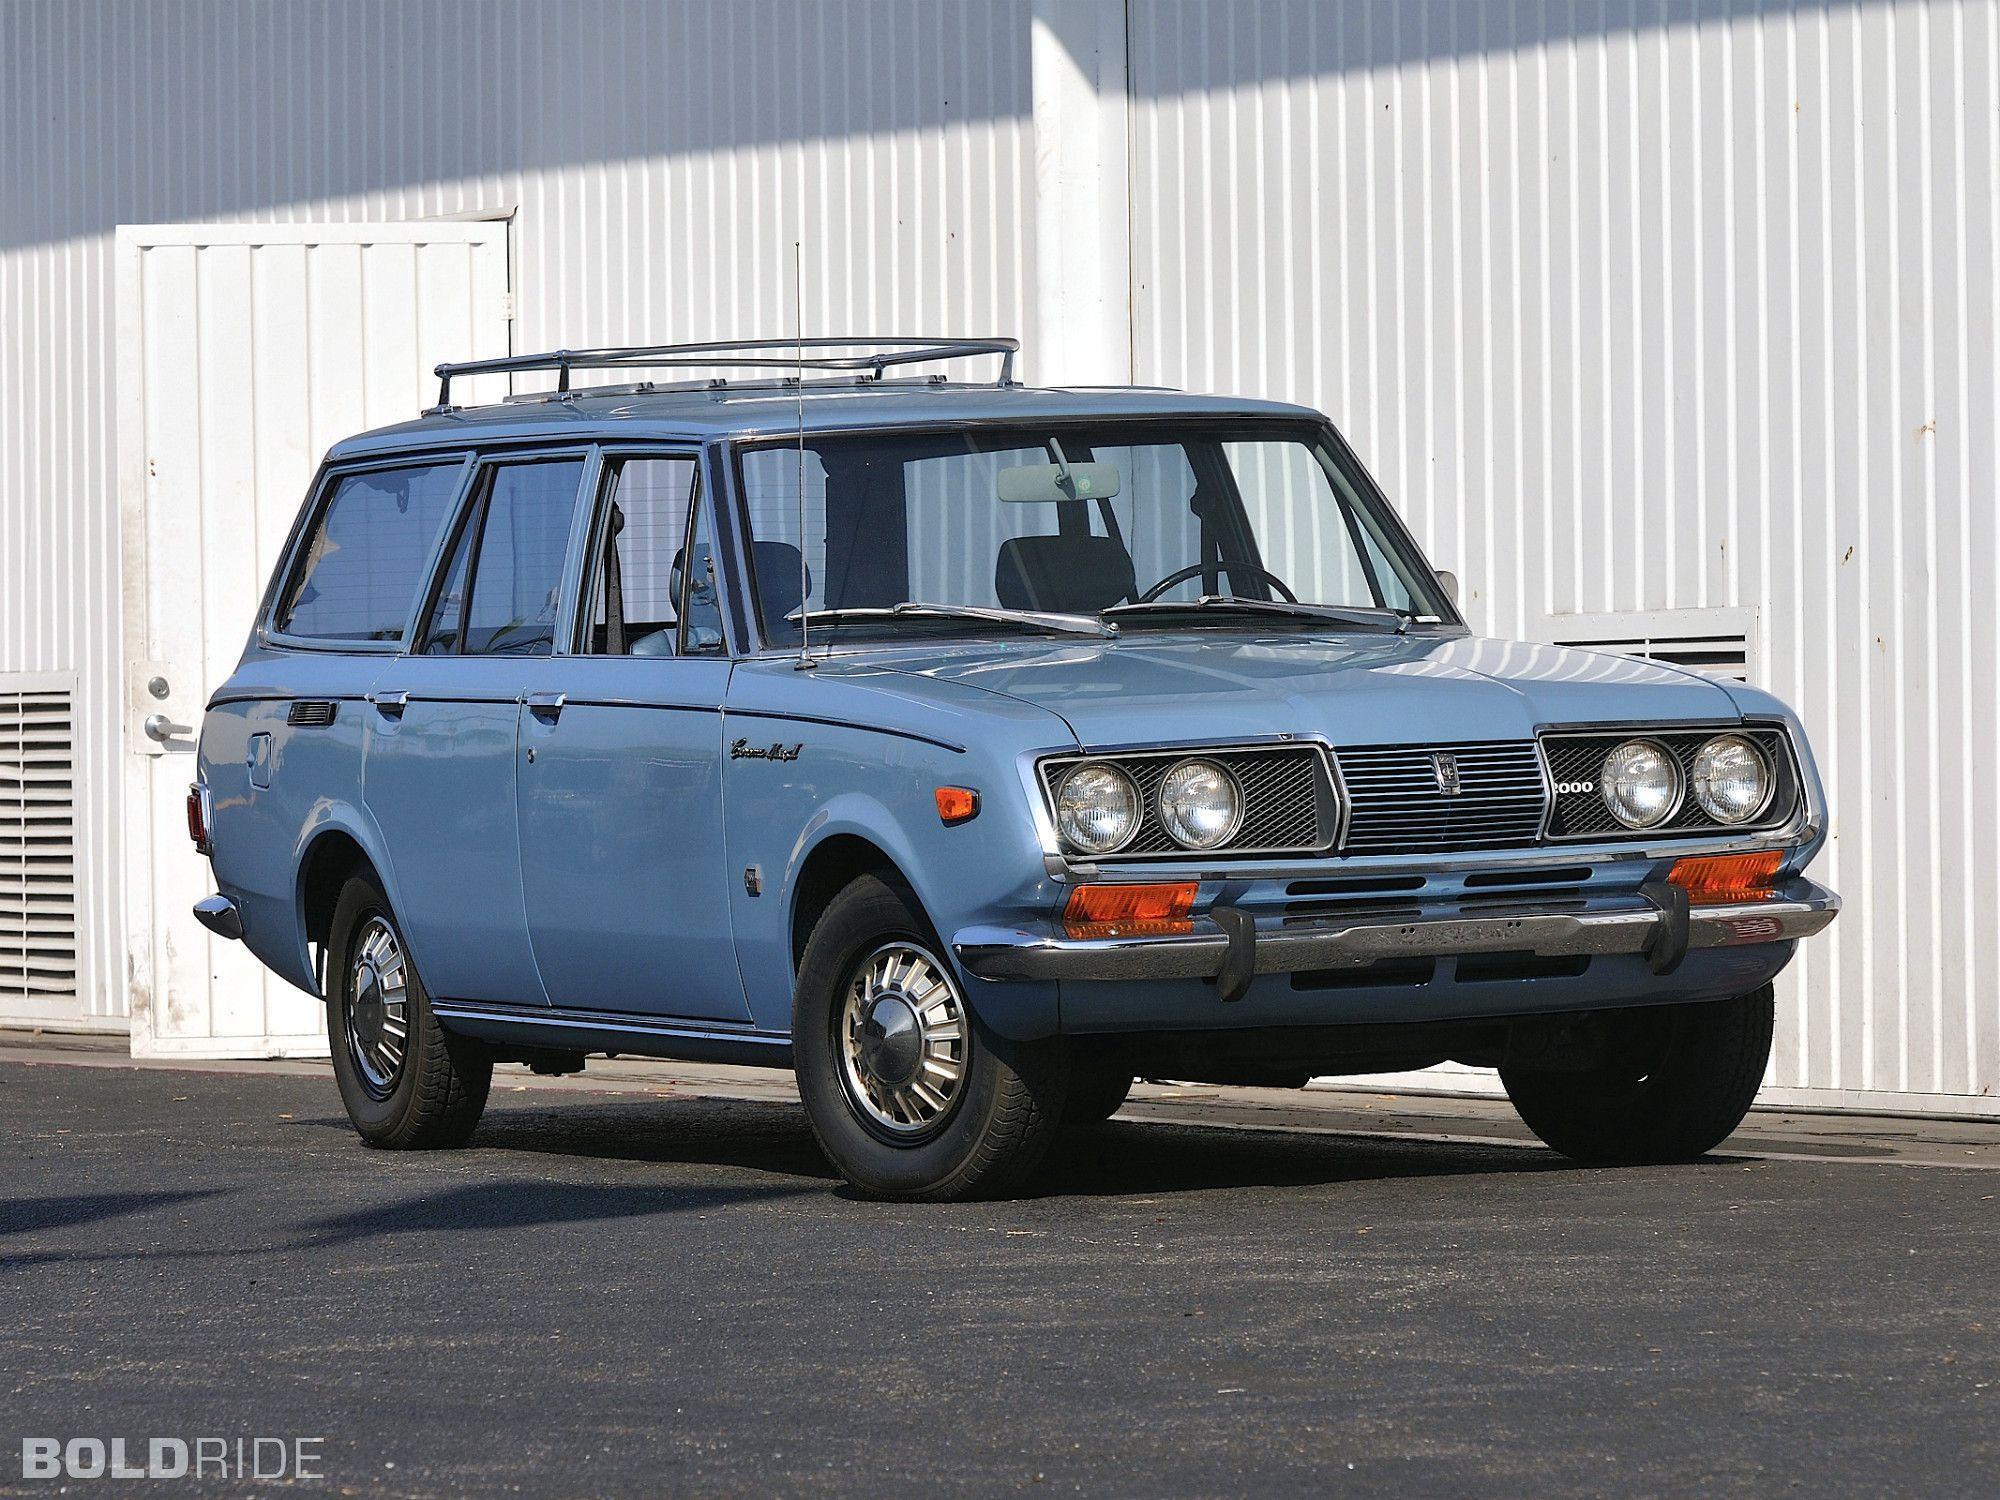 1968 72 toyota corona mark ii wagon classic cars. Black Bedroom Furniture Sets. Home Design Ideas